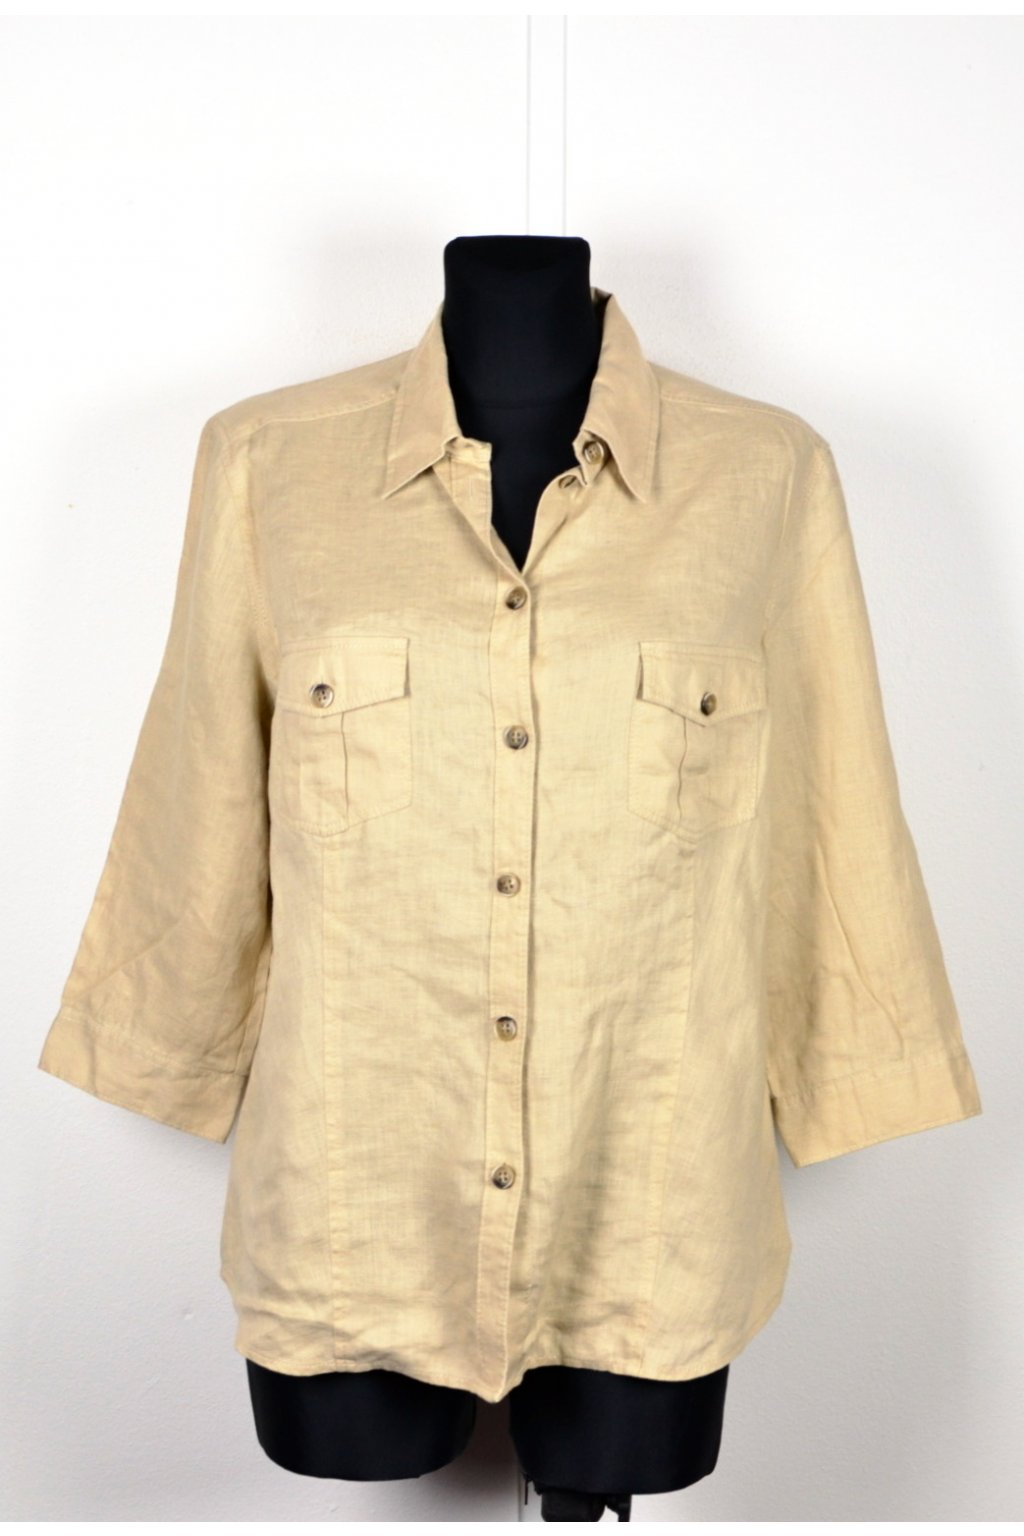 Halenka košile Marco Pecci vel. 44 / L 100% len